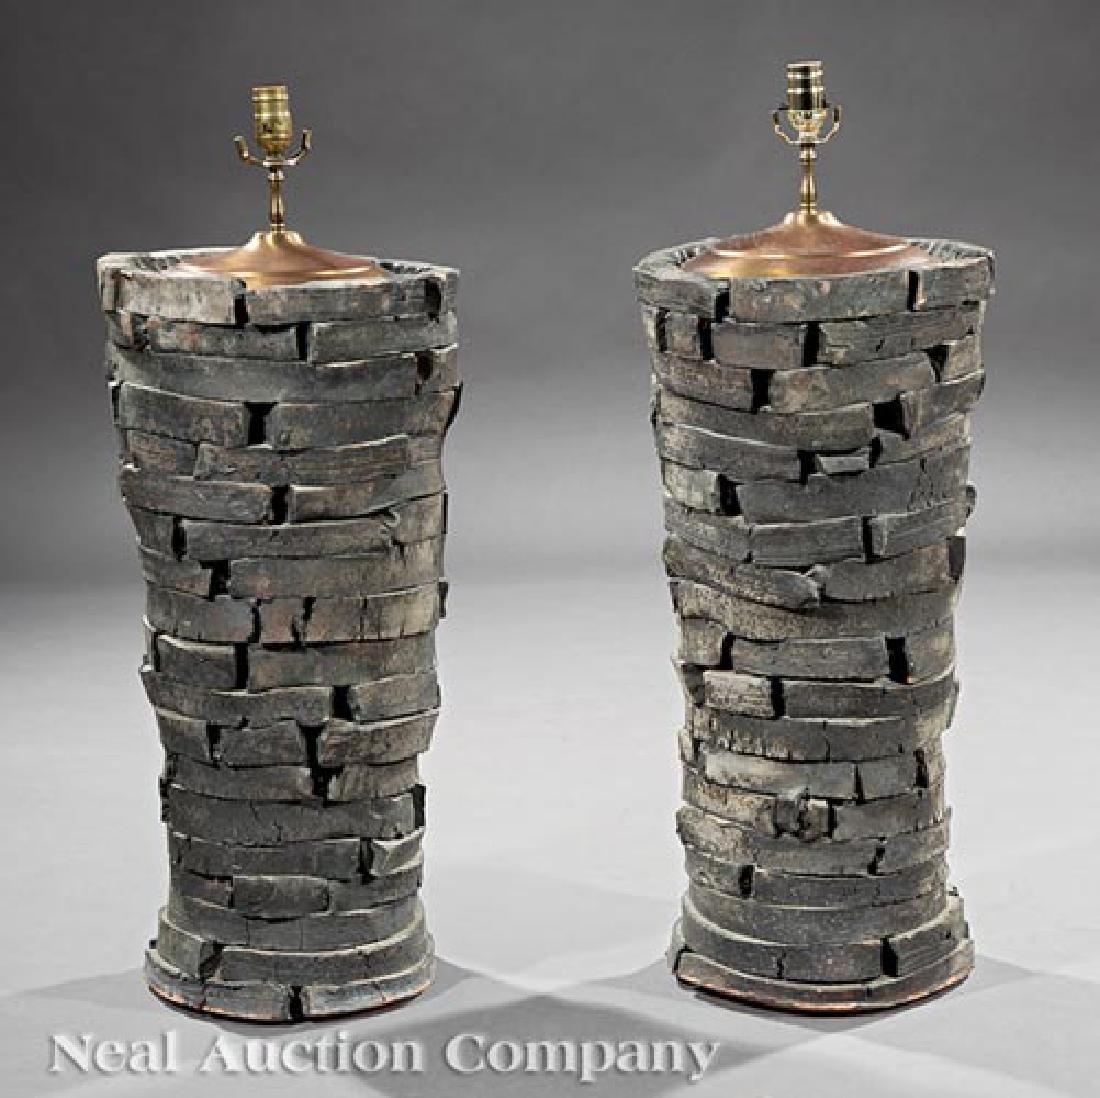 Peter Lane Glazed Stoneware Table Lamps - 4